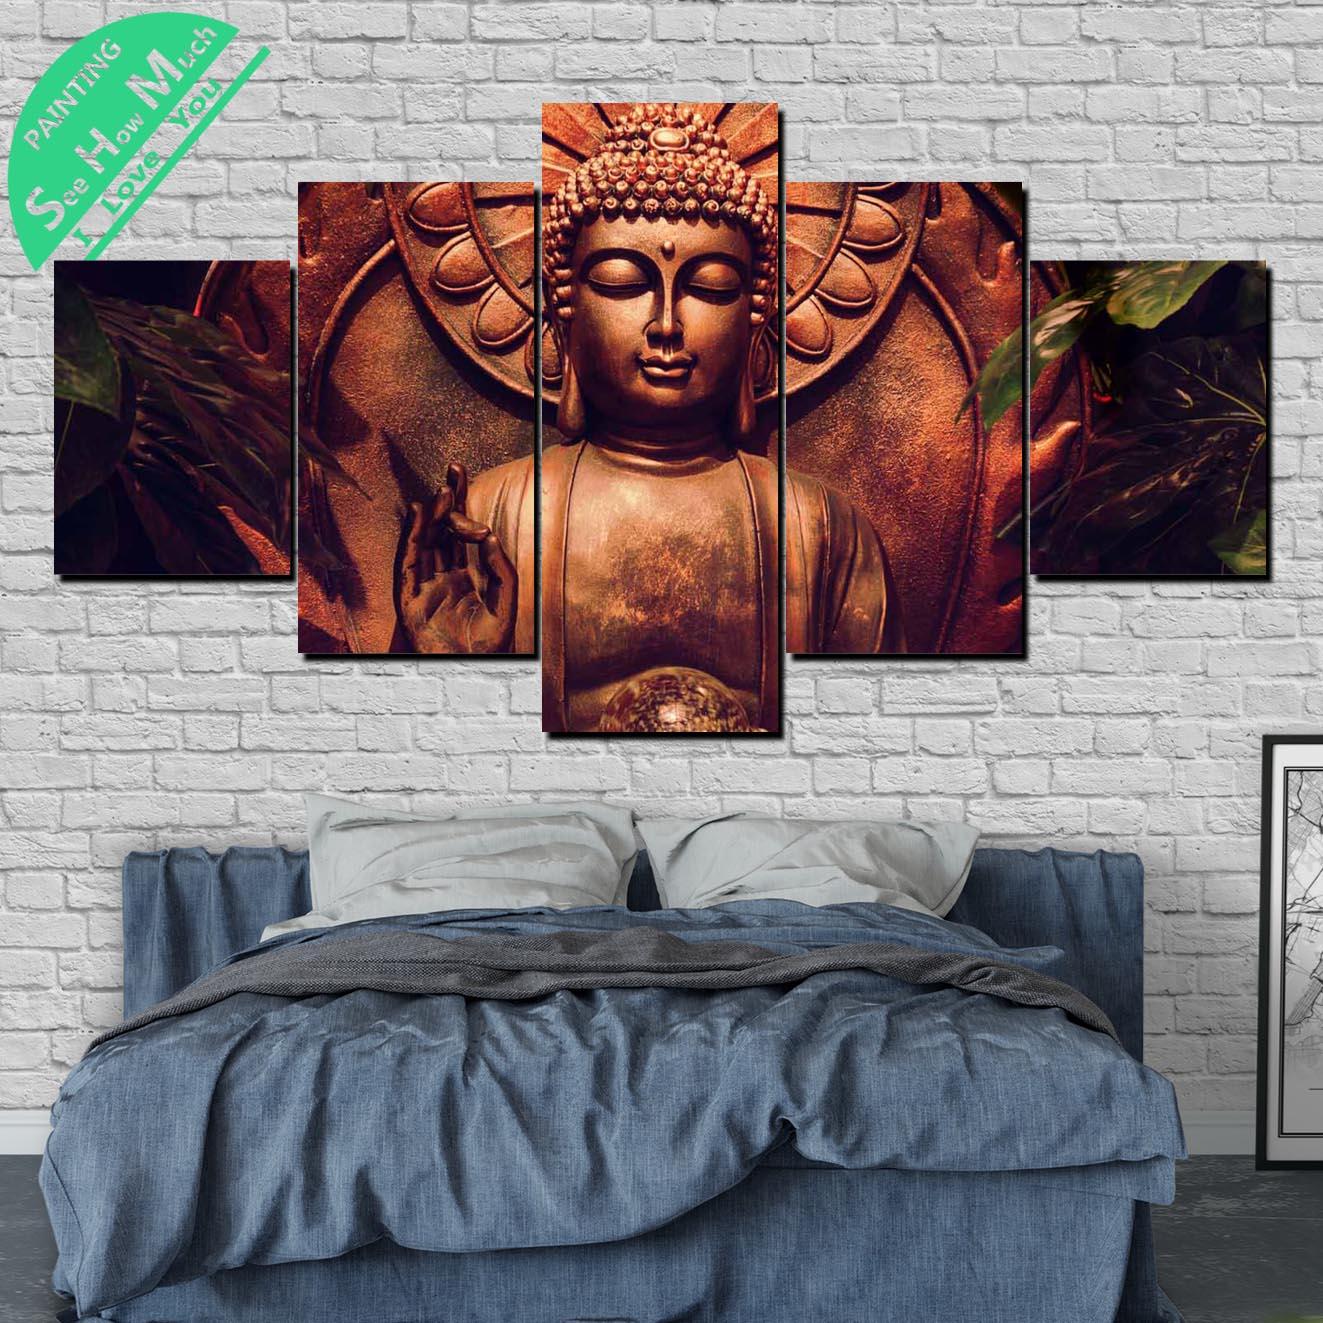 5 Шт. Медитация Будды Холст Картины Wall Art Pictures Печать на Холсте Home Decor Плакат Украшения